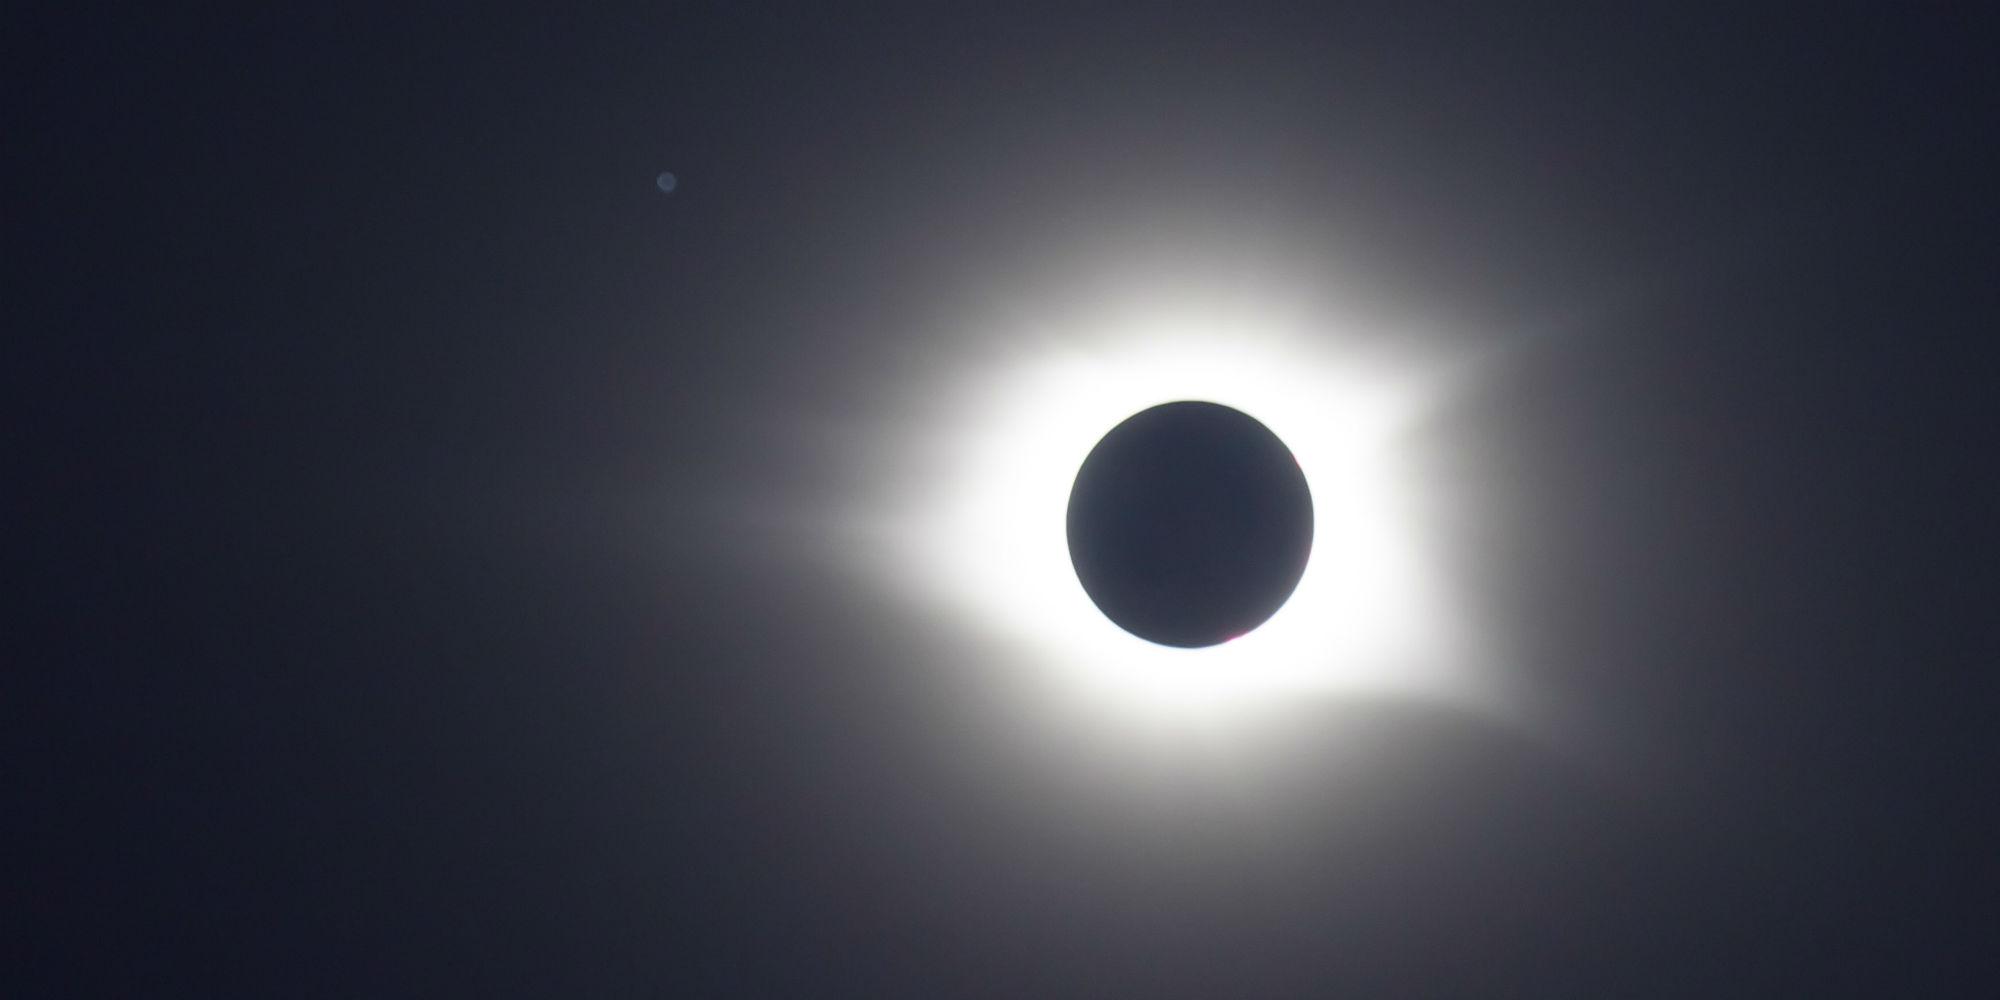 Kakve to misteriozne pojave krije Zemljina sestra Venera?